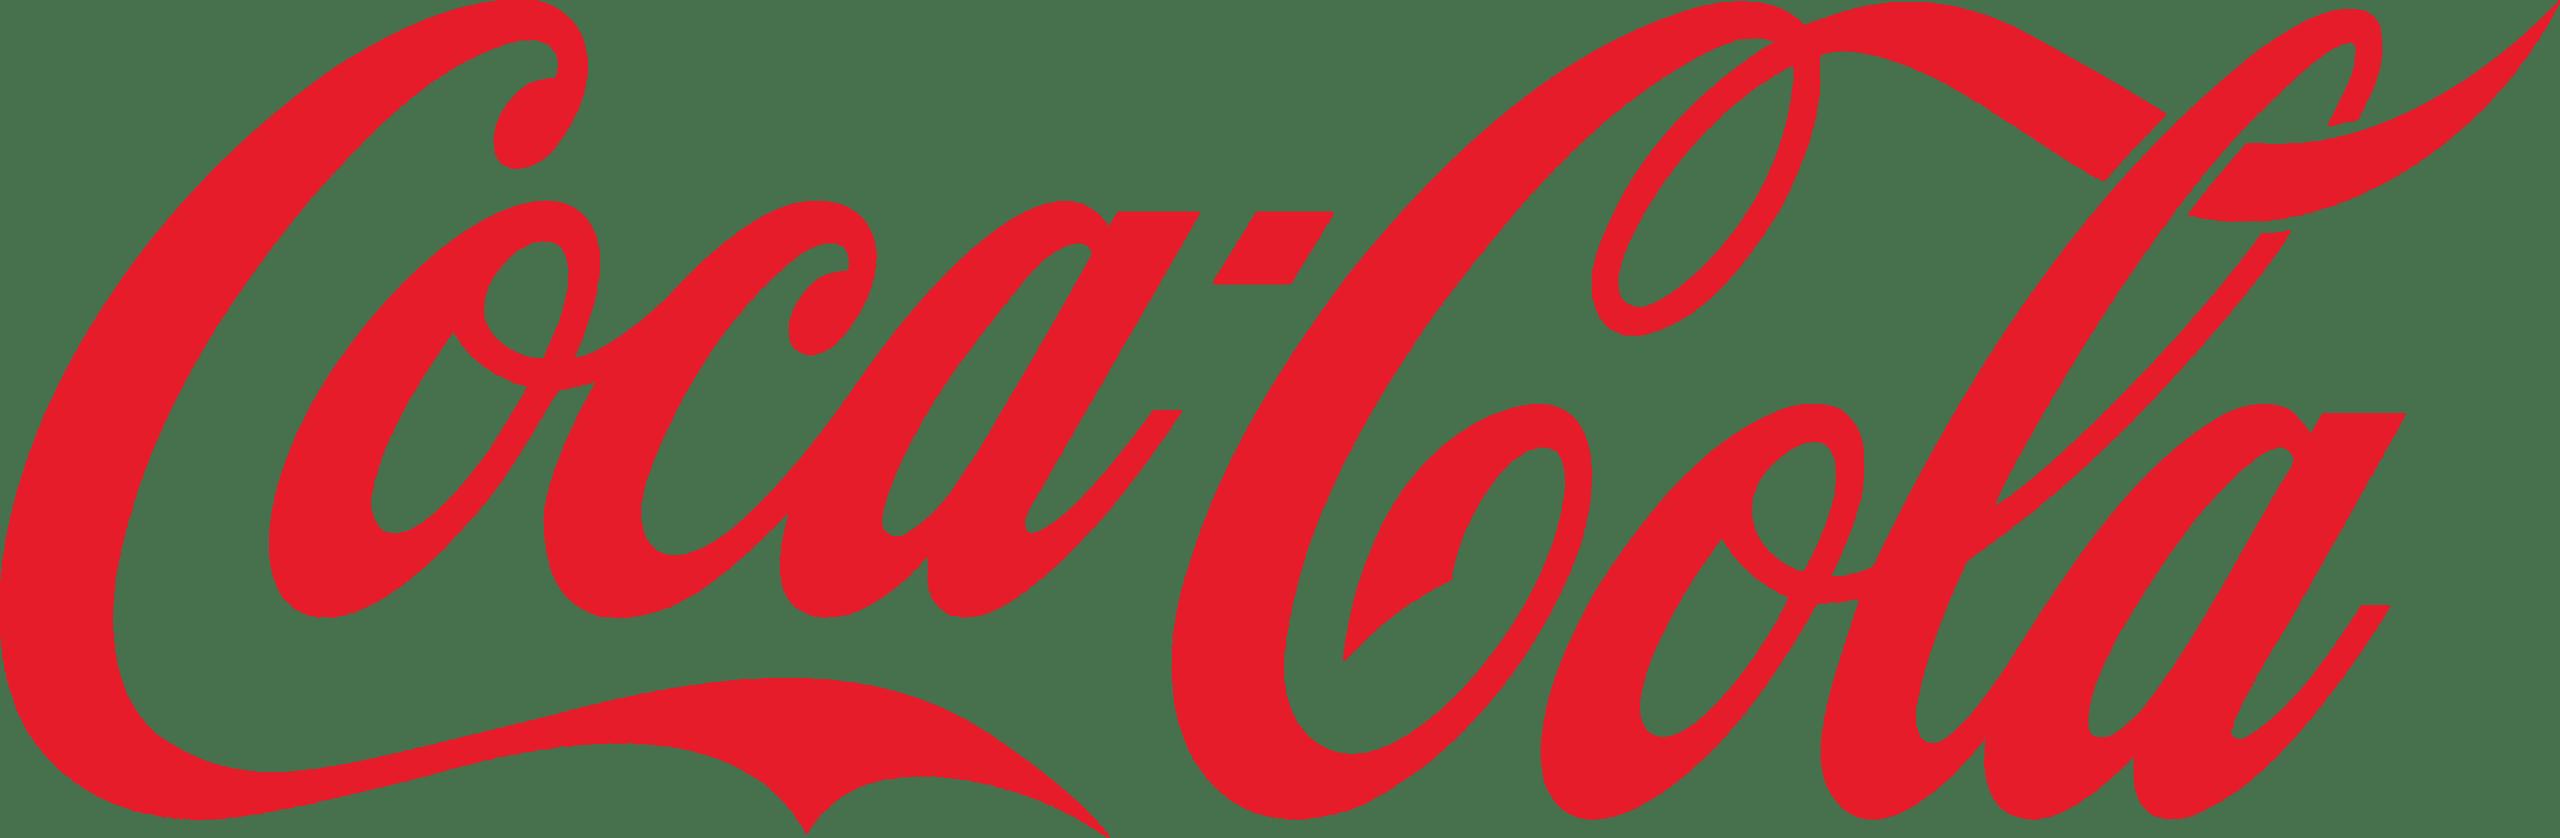 coca-cola-logo-1